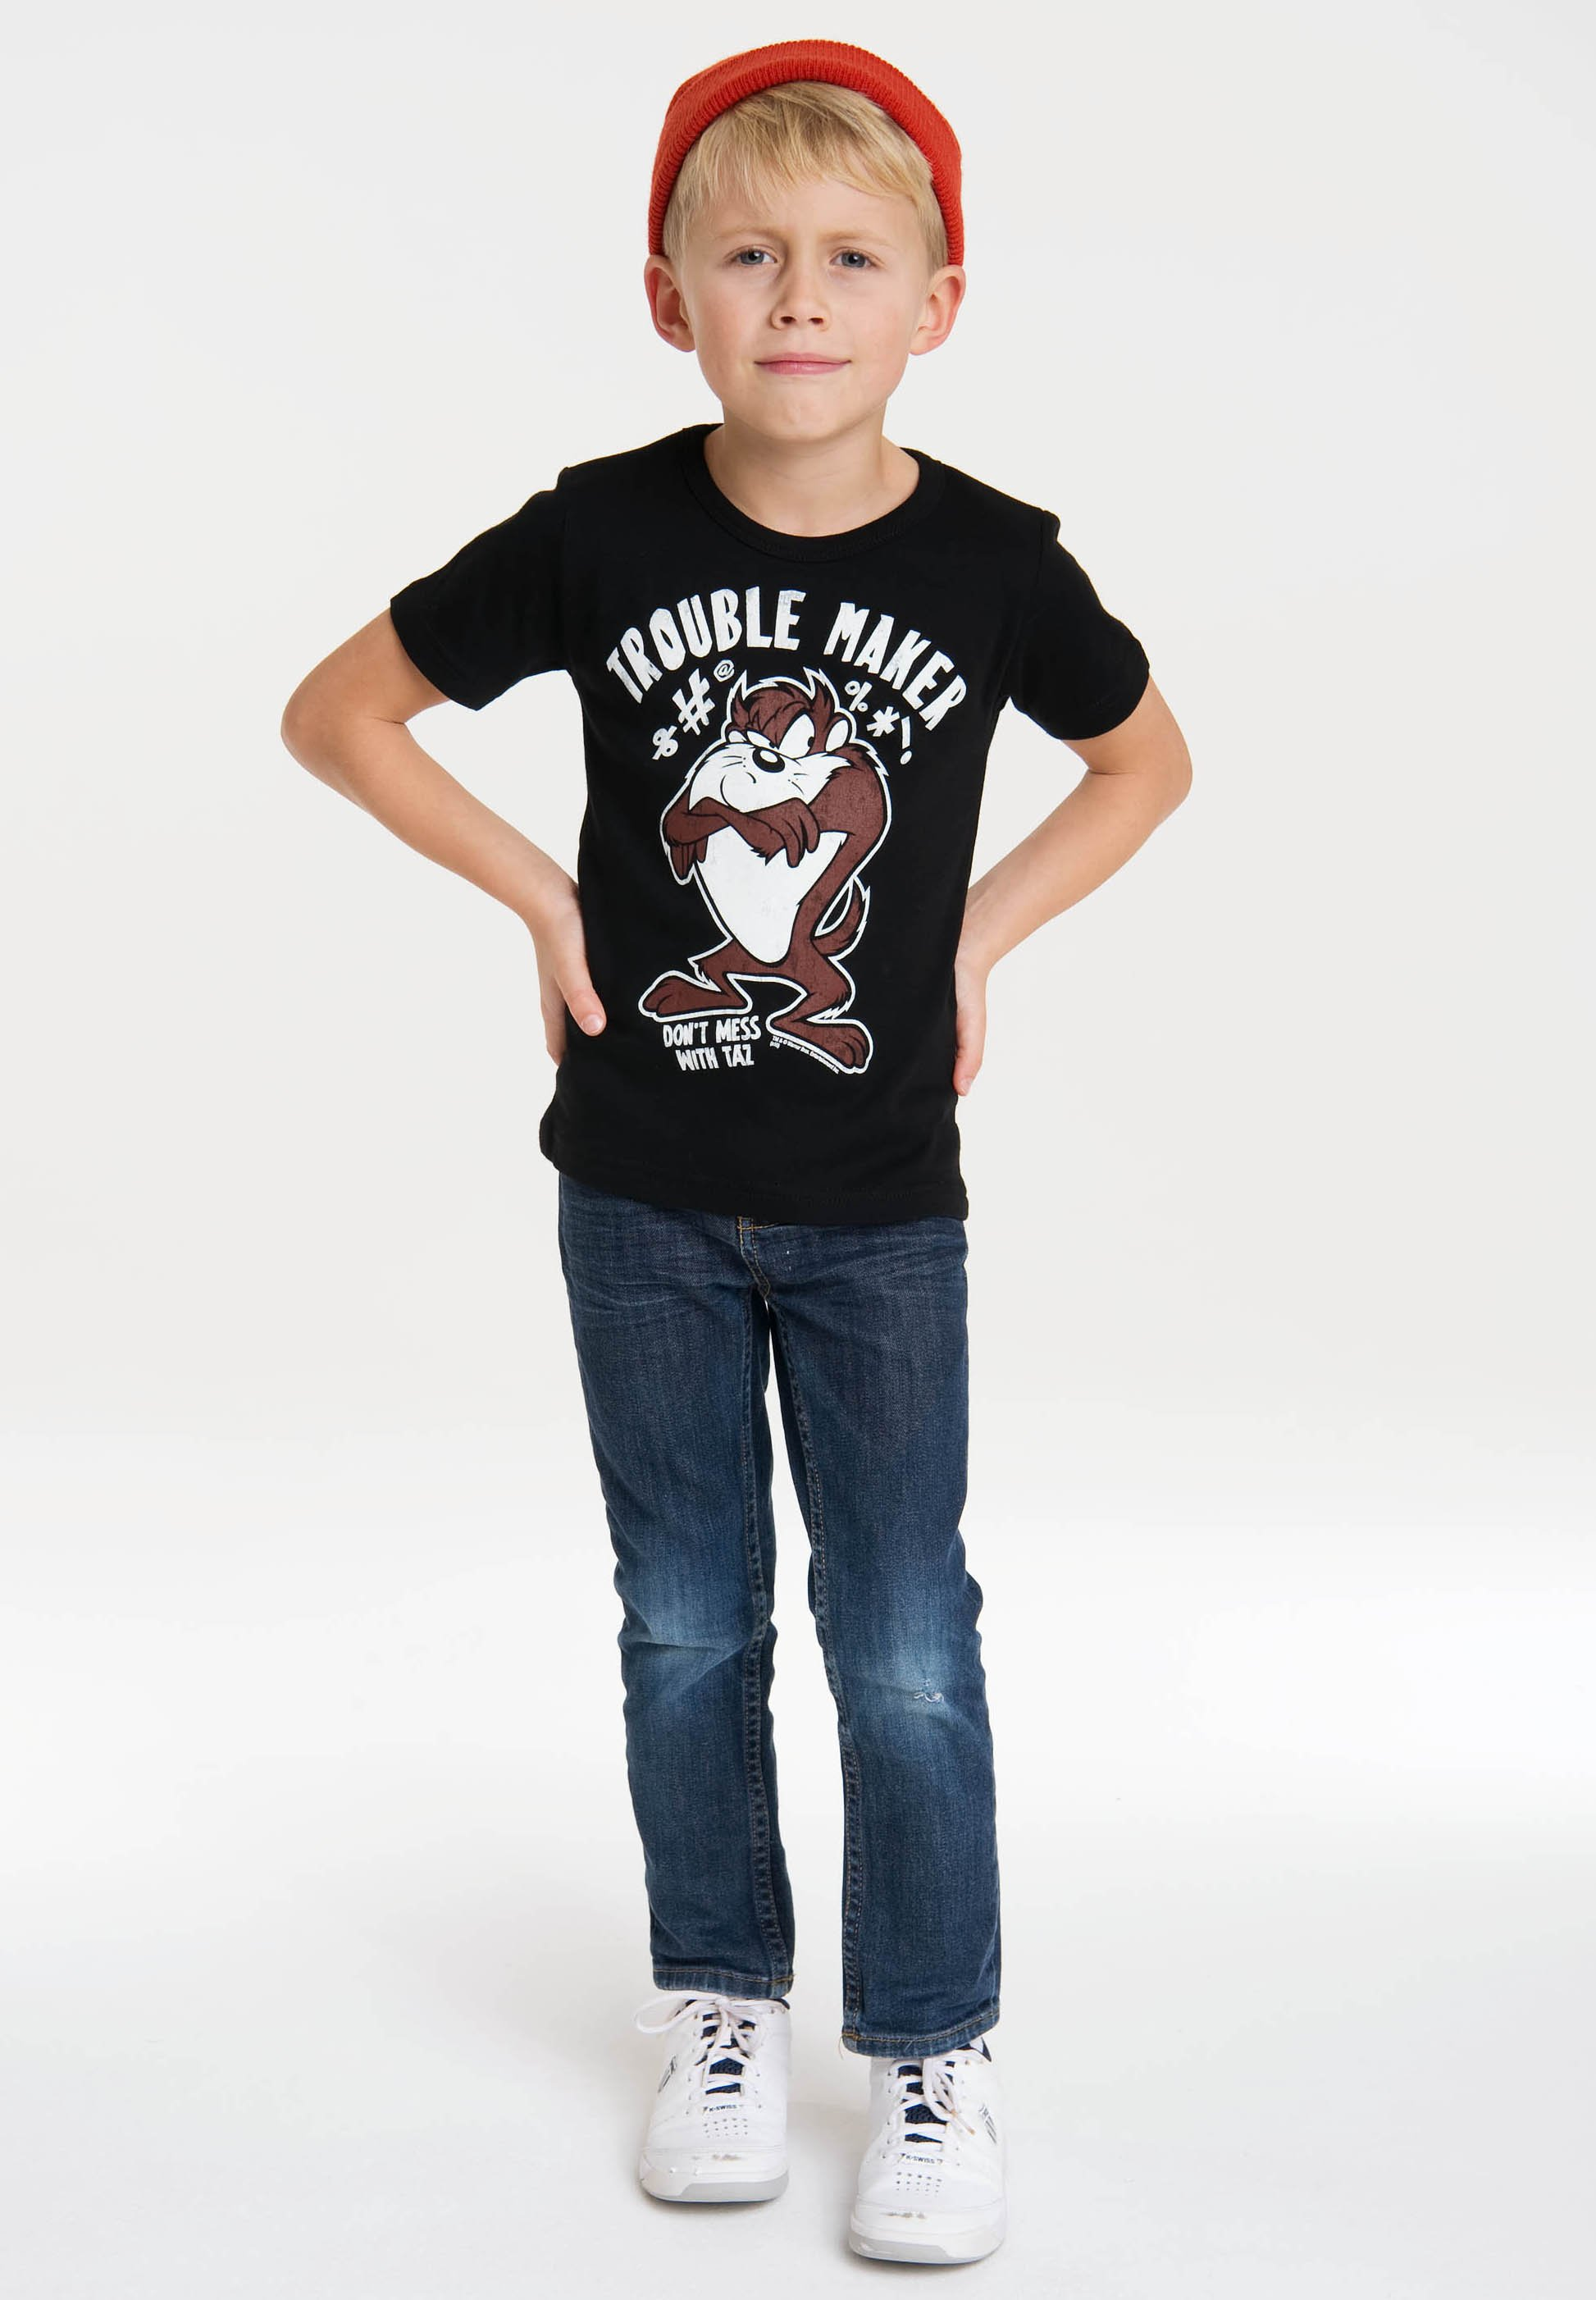 Kinder LOONEY TUNES - TROUBLE MAKER - T-Shirt print